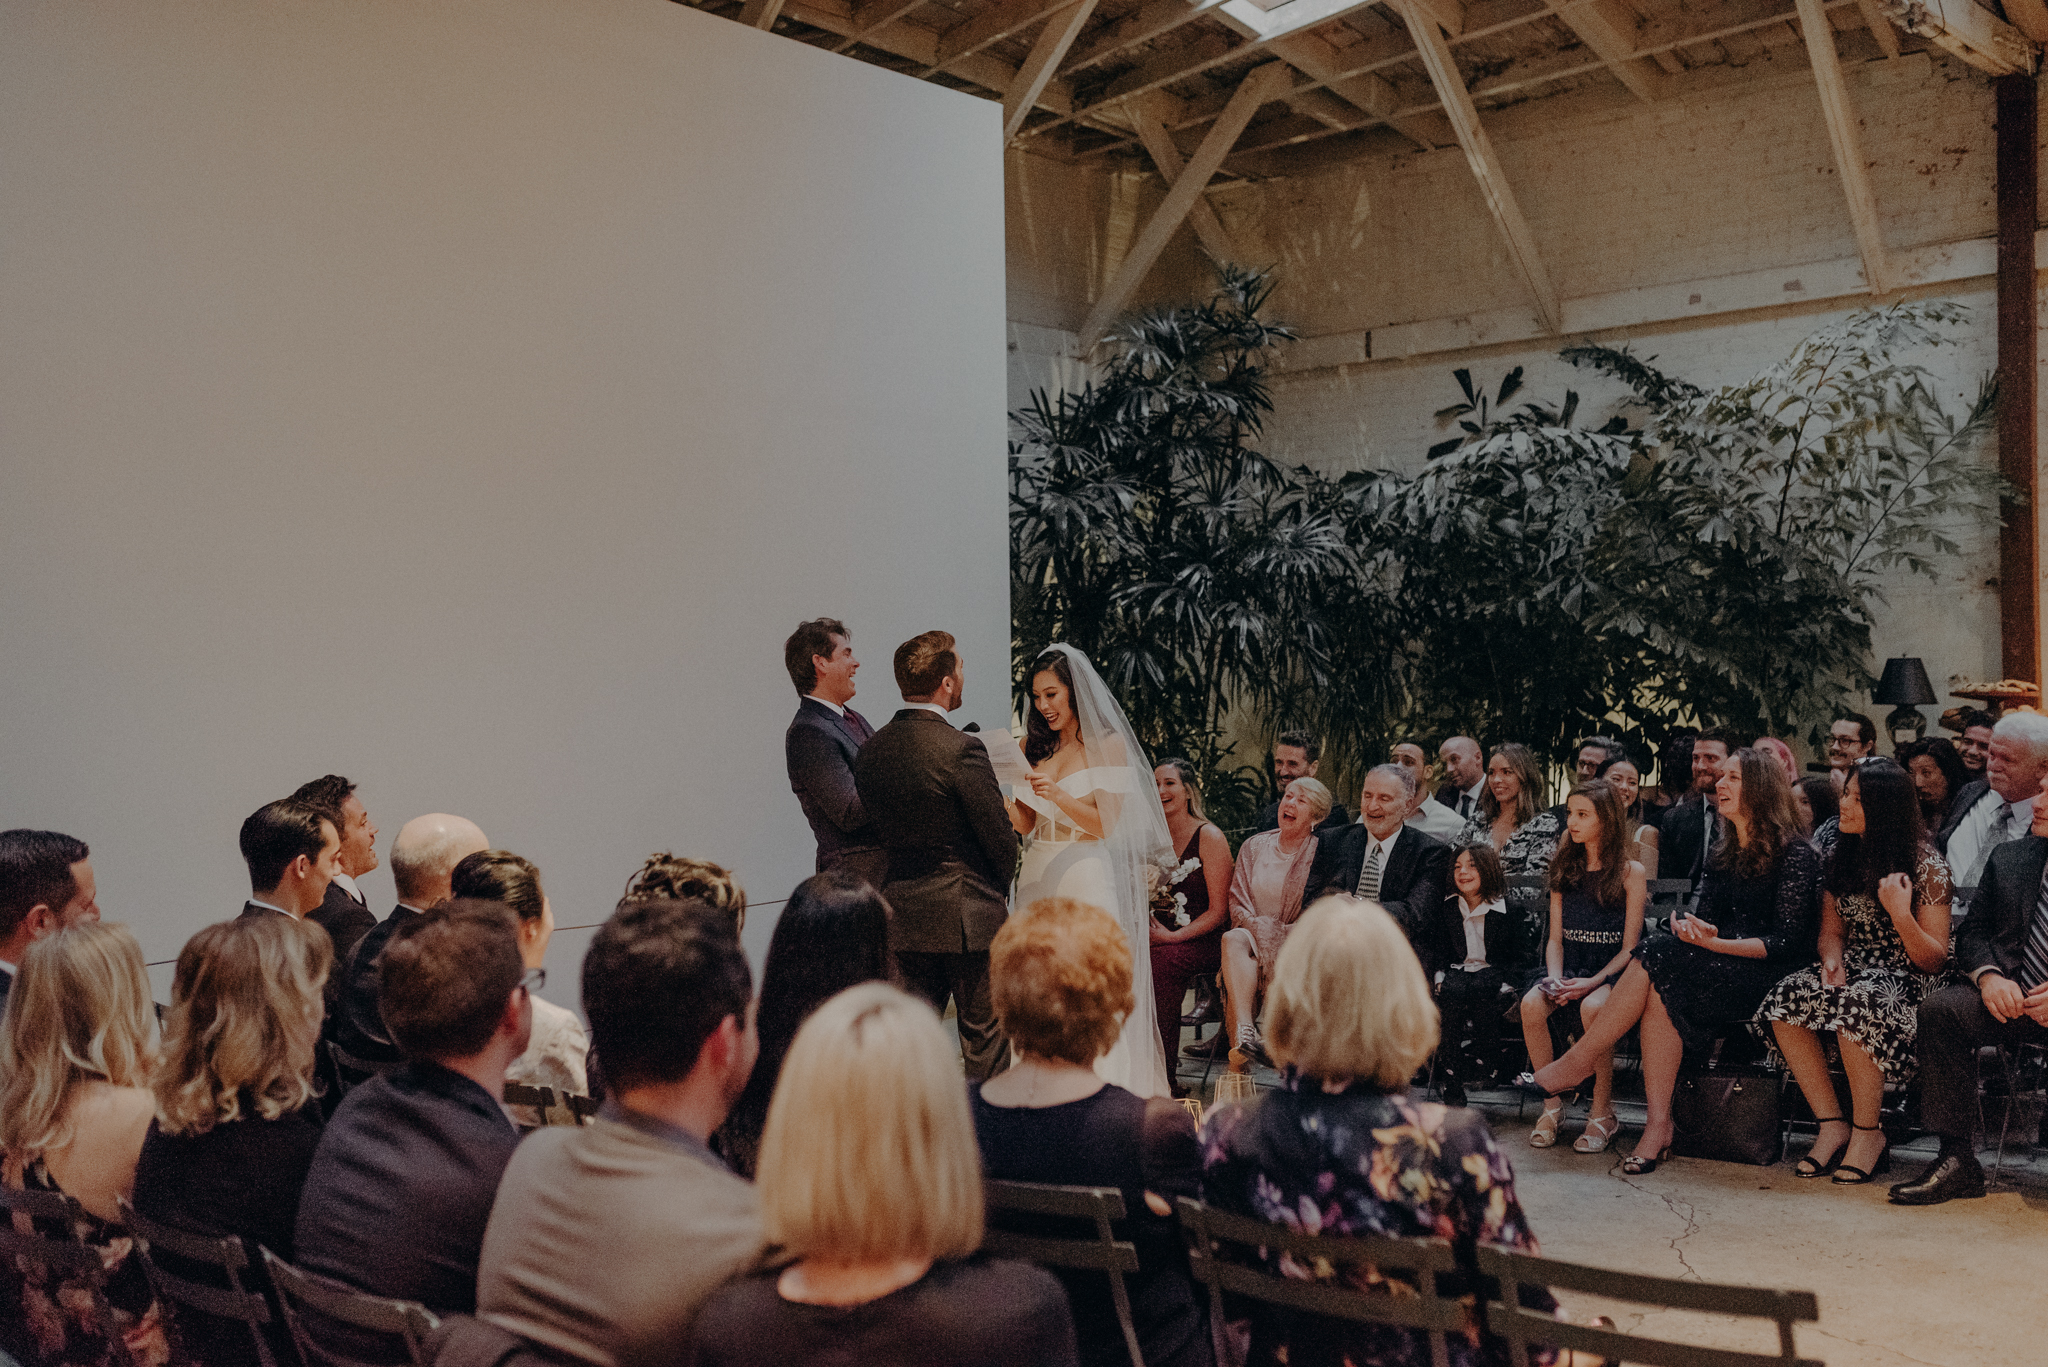 Wedding Photo LA - wedding photographer in los angeles - millwick wedding venue -isaiahandtaylor.com-099.jpg